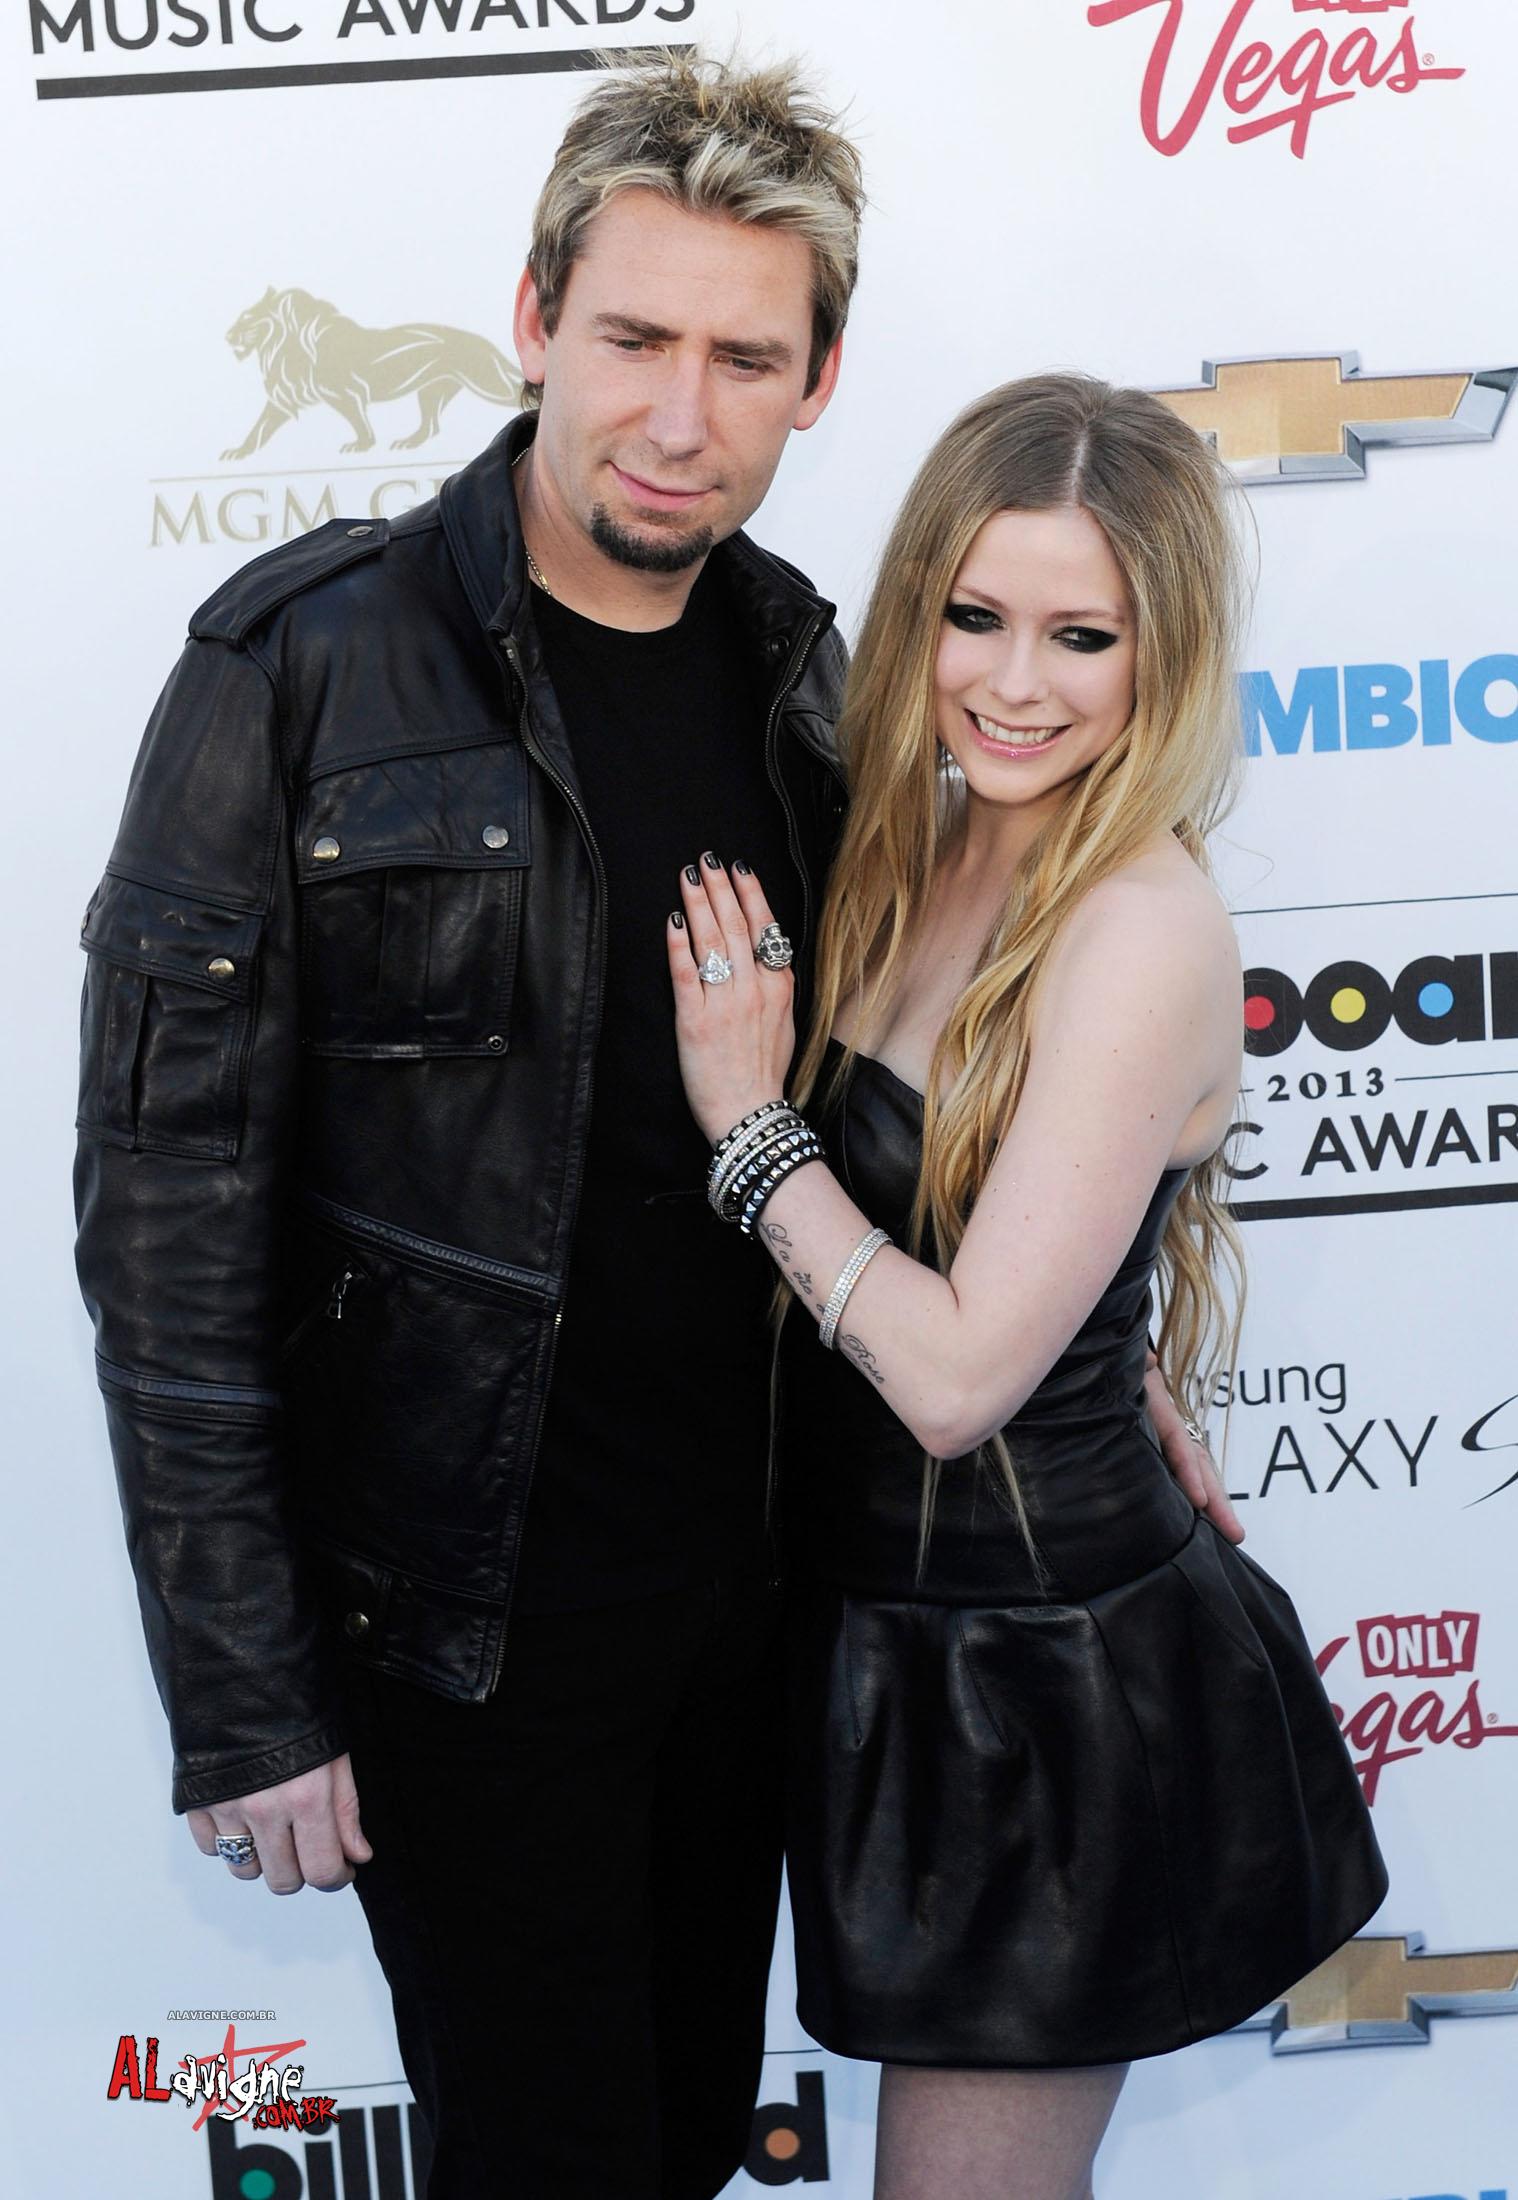 Billboard Music Awards 2013 10